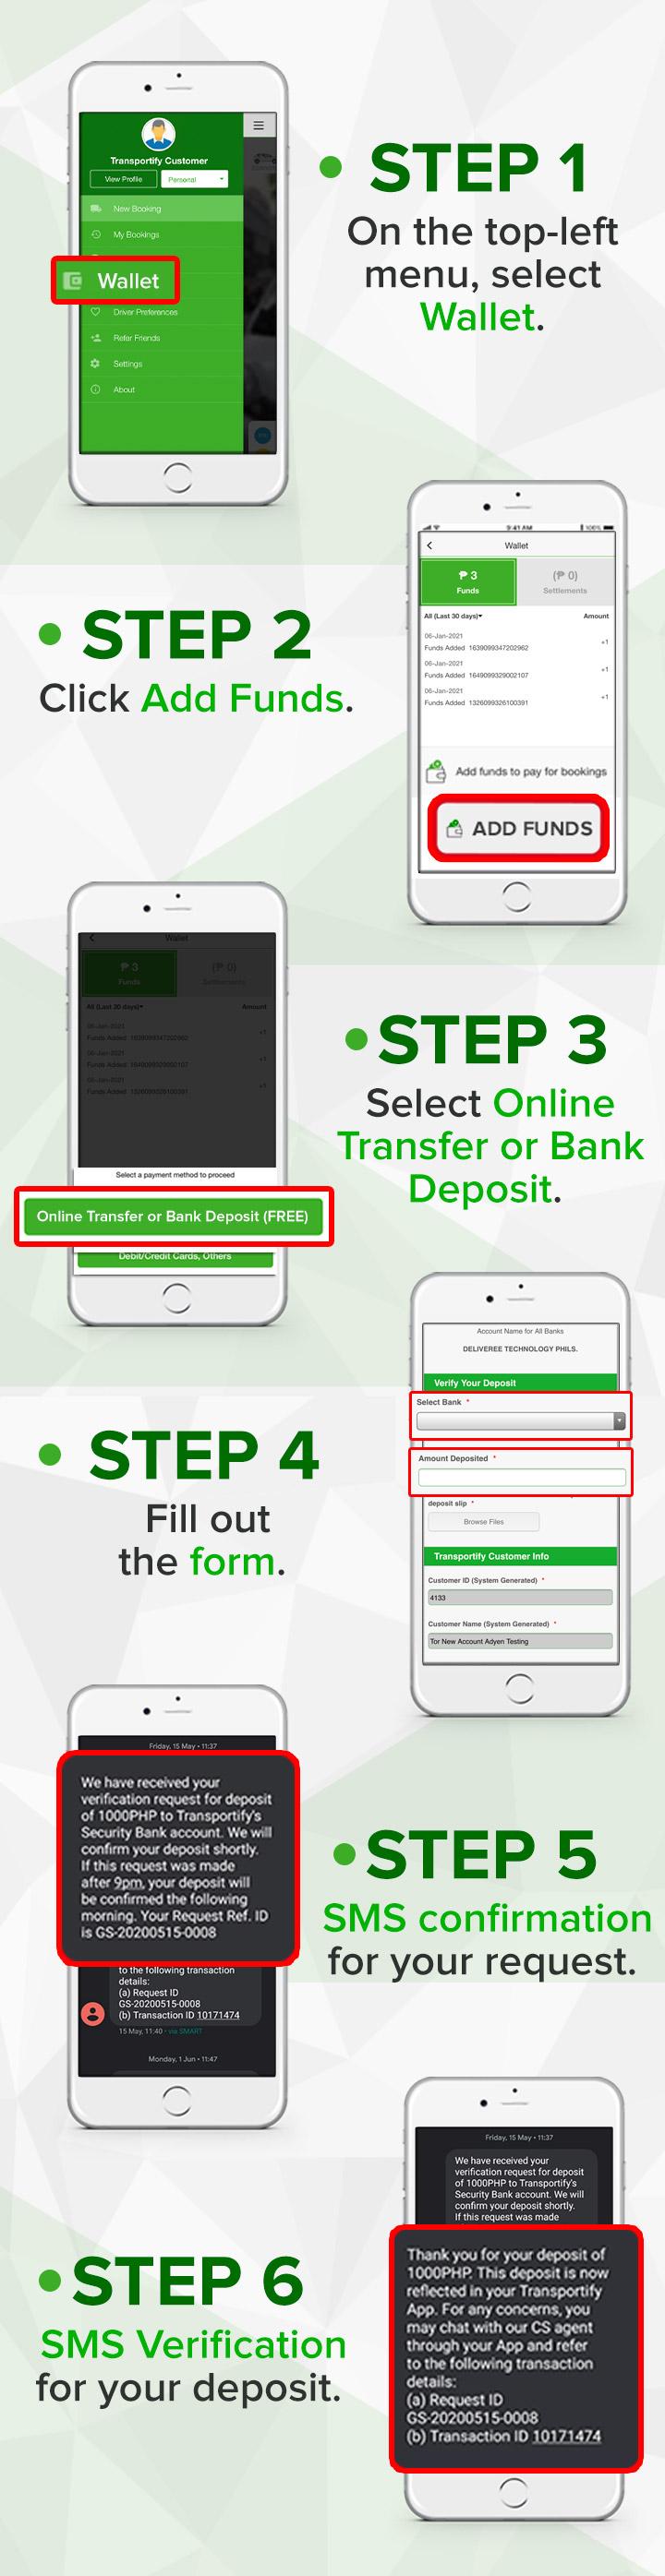 Bank Transfer Instructions